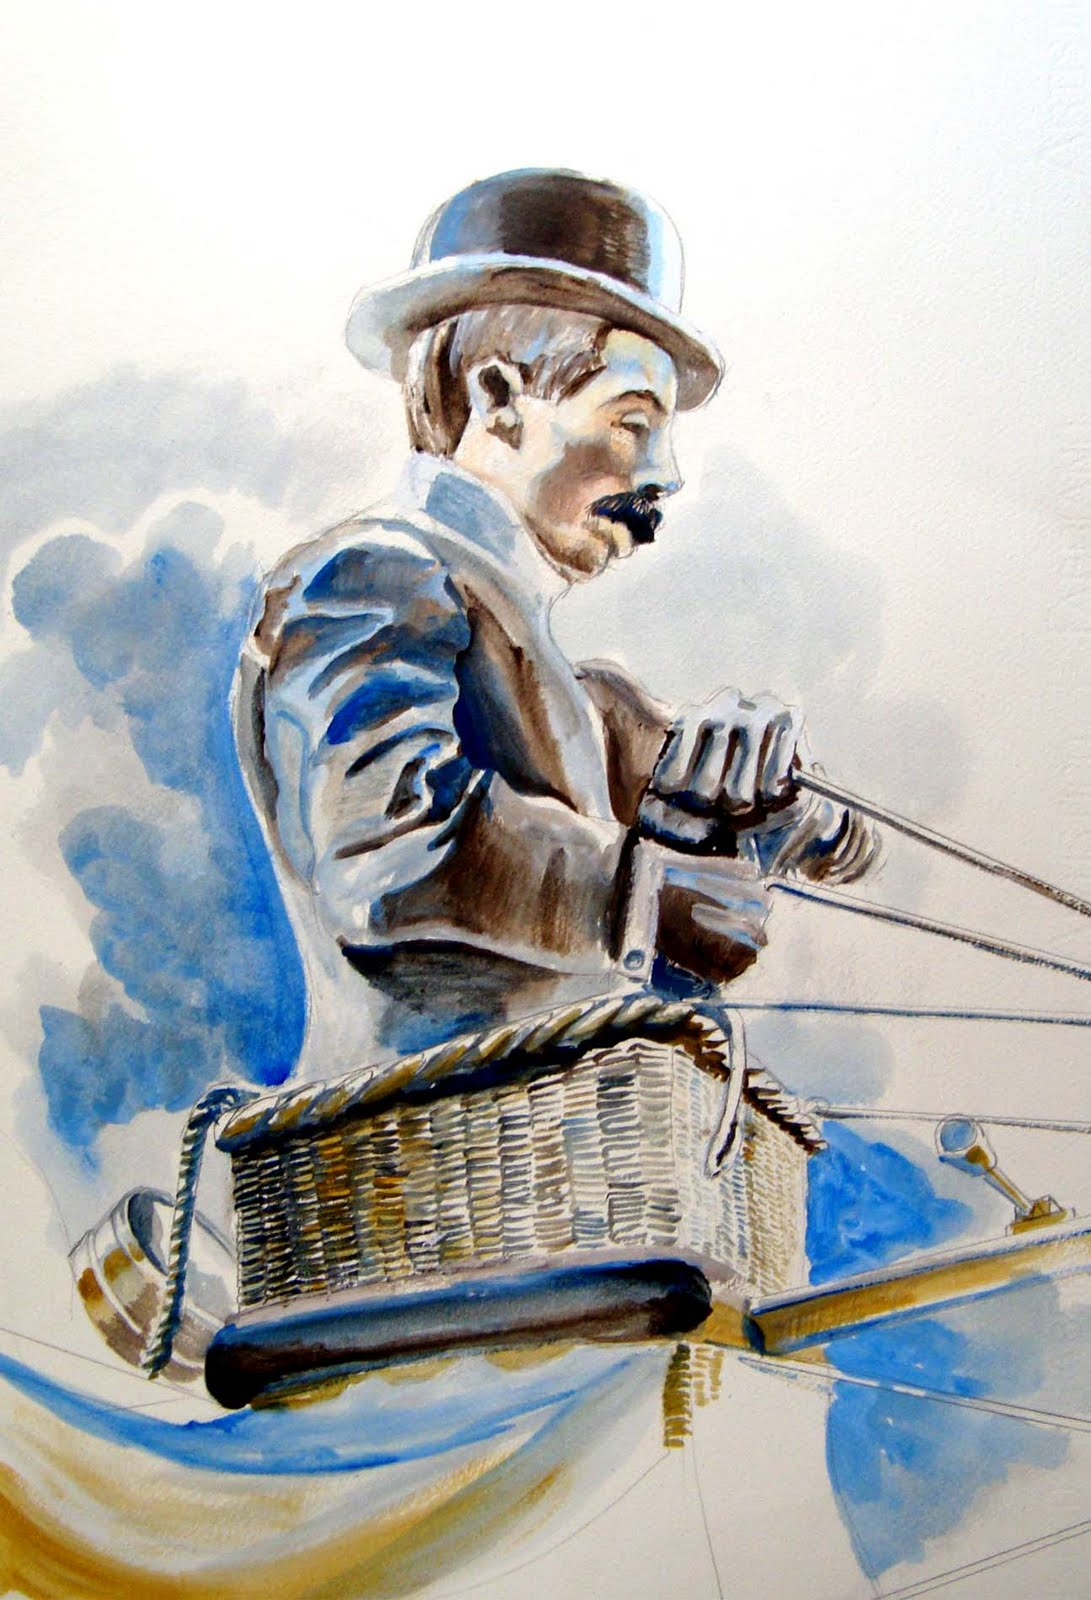 62aaf00a4e1 A Maravilhosa vida de Santos Dumont por Luiz Pagano  Cartier Santos ...